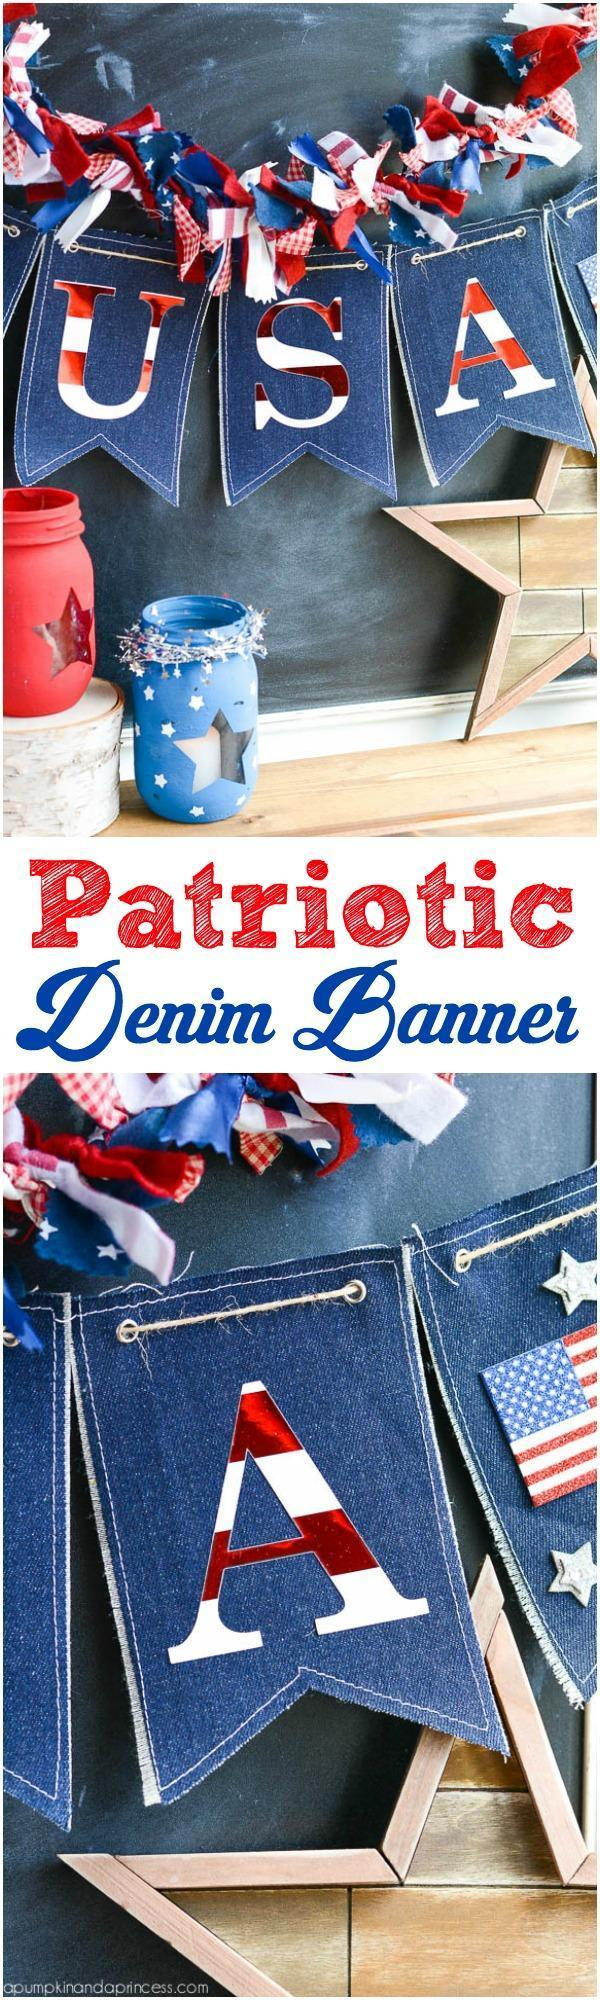 36 DIY Patriotic Denim Banner